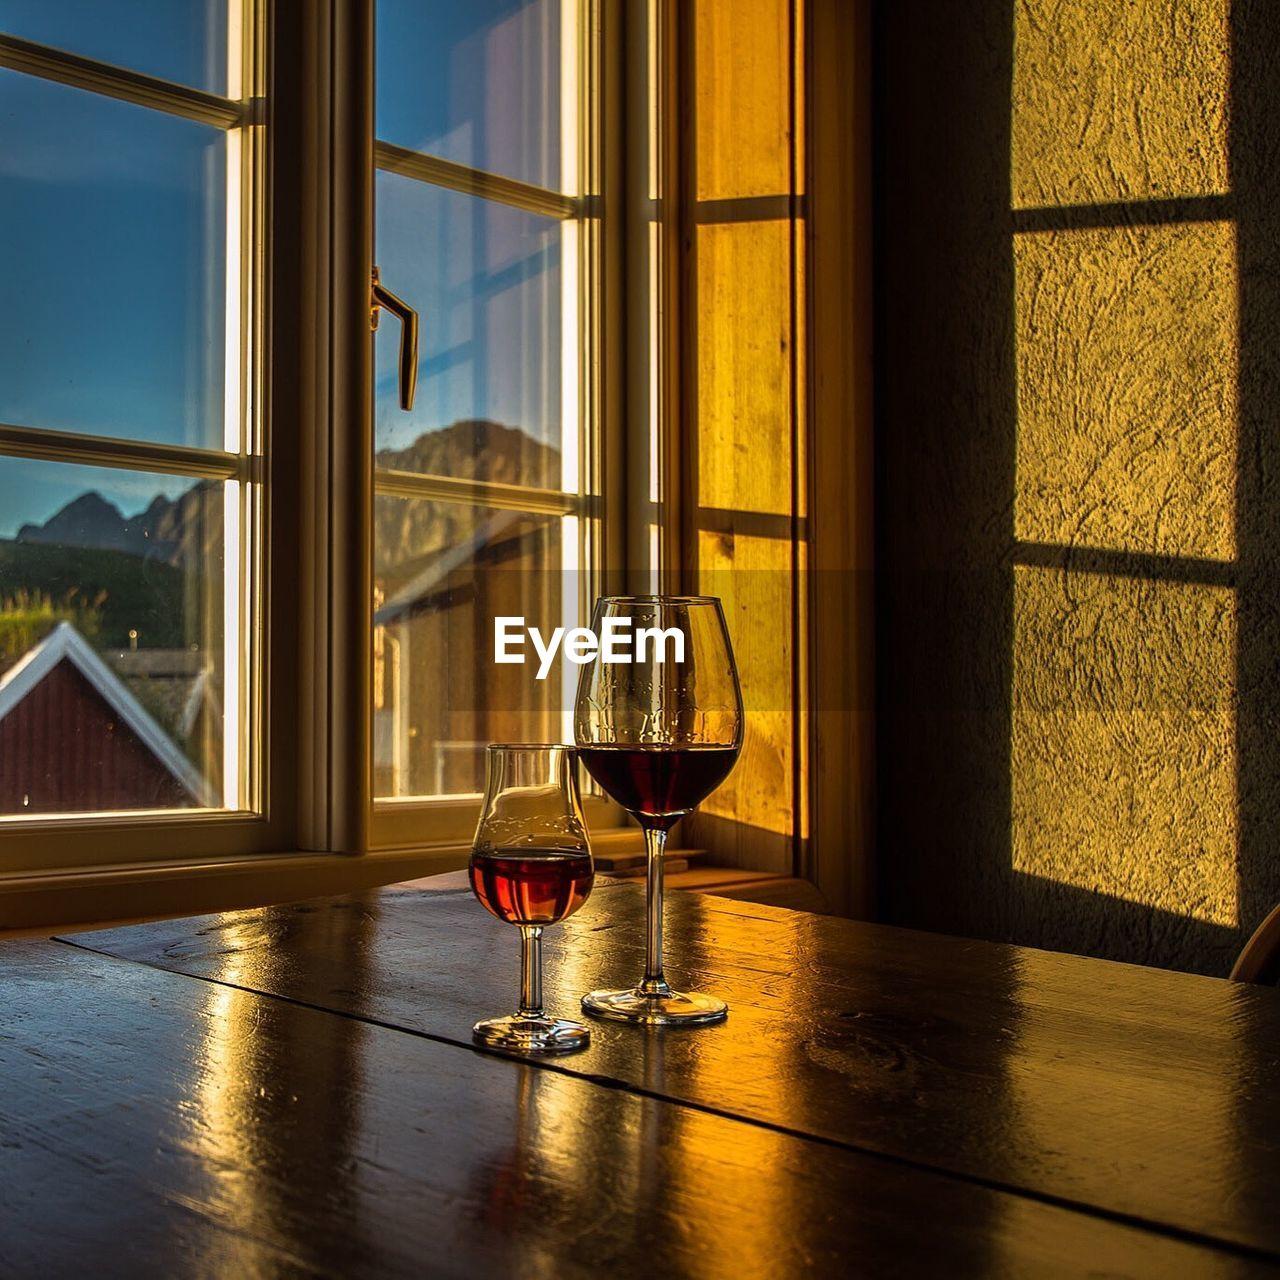 Wineglasses And Window